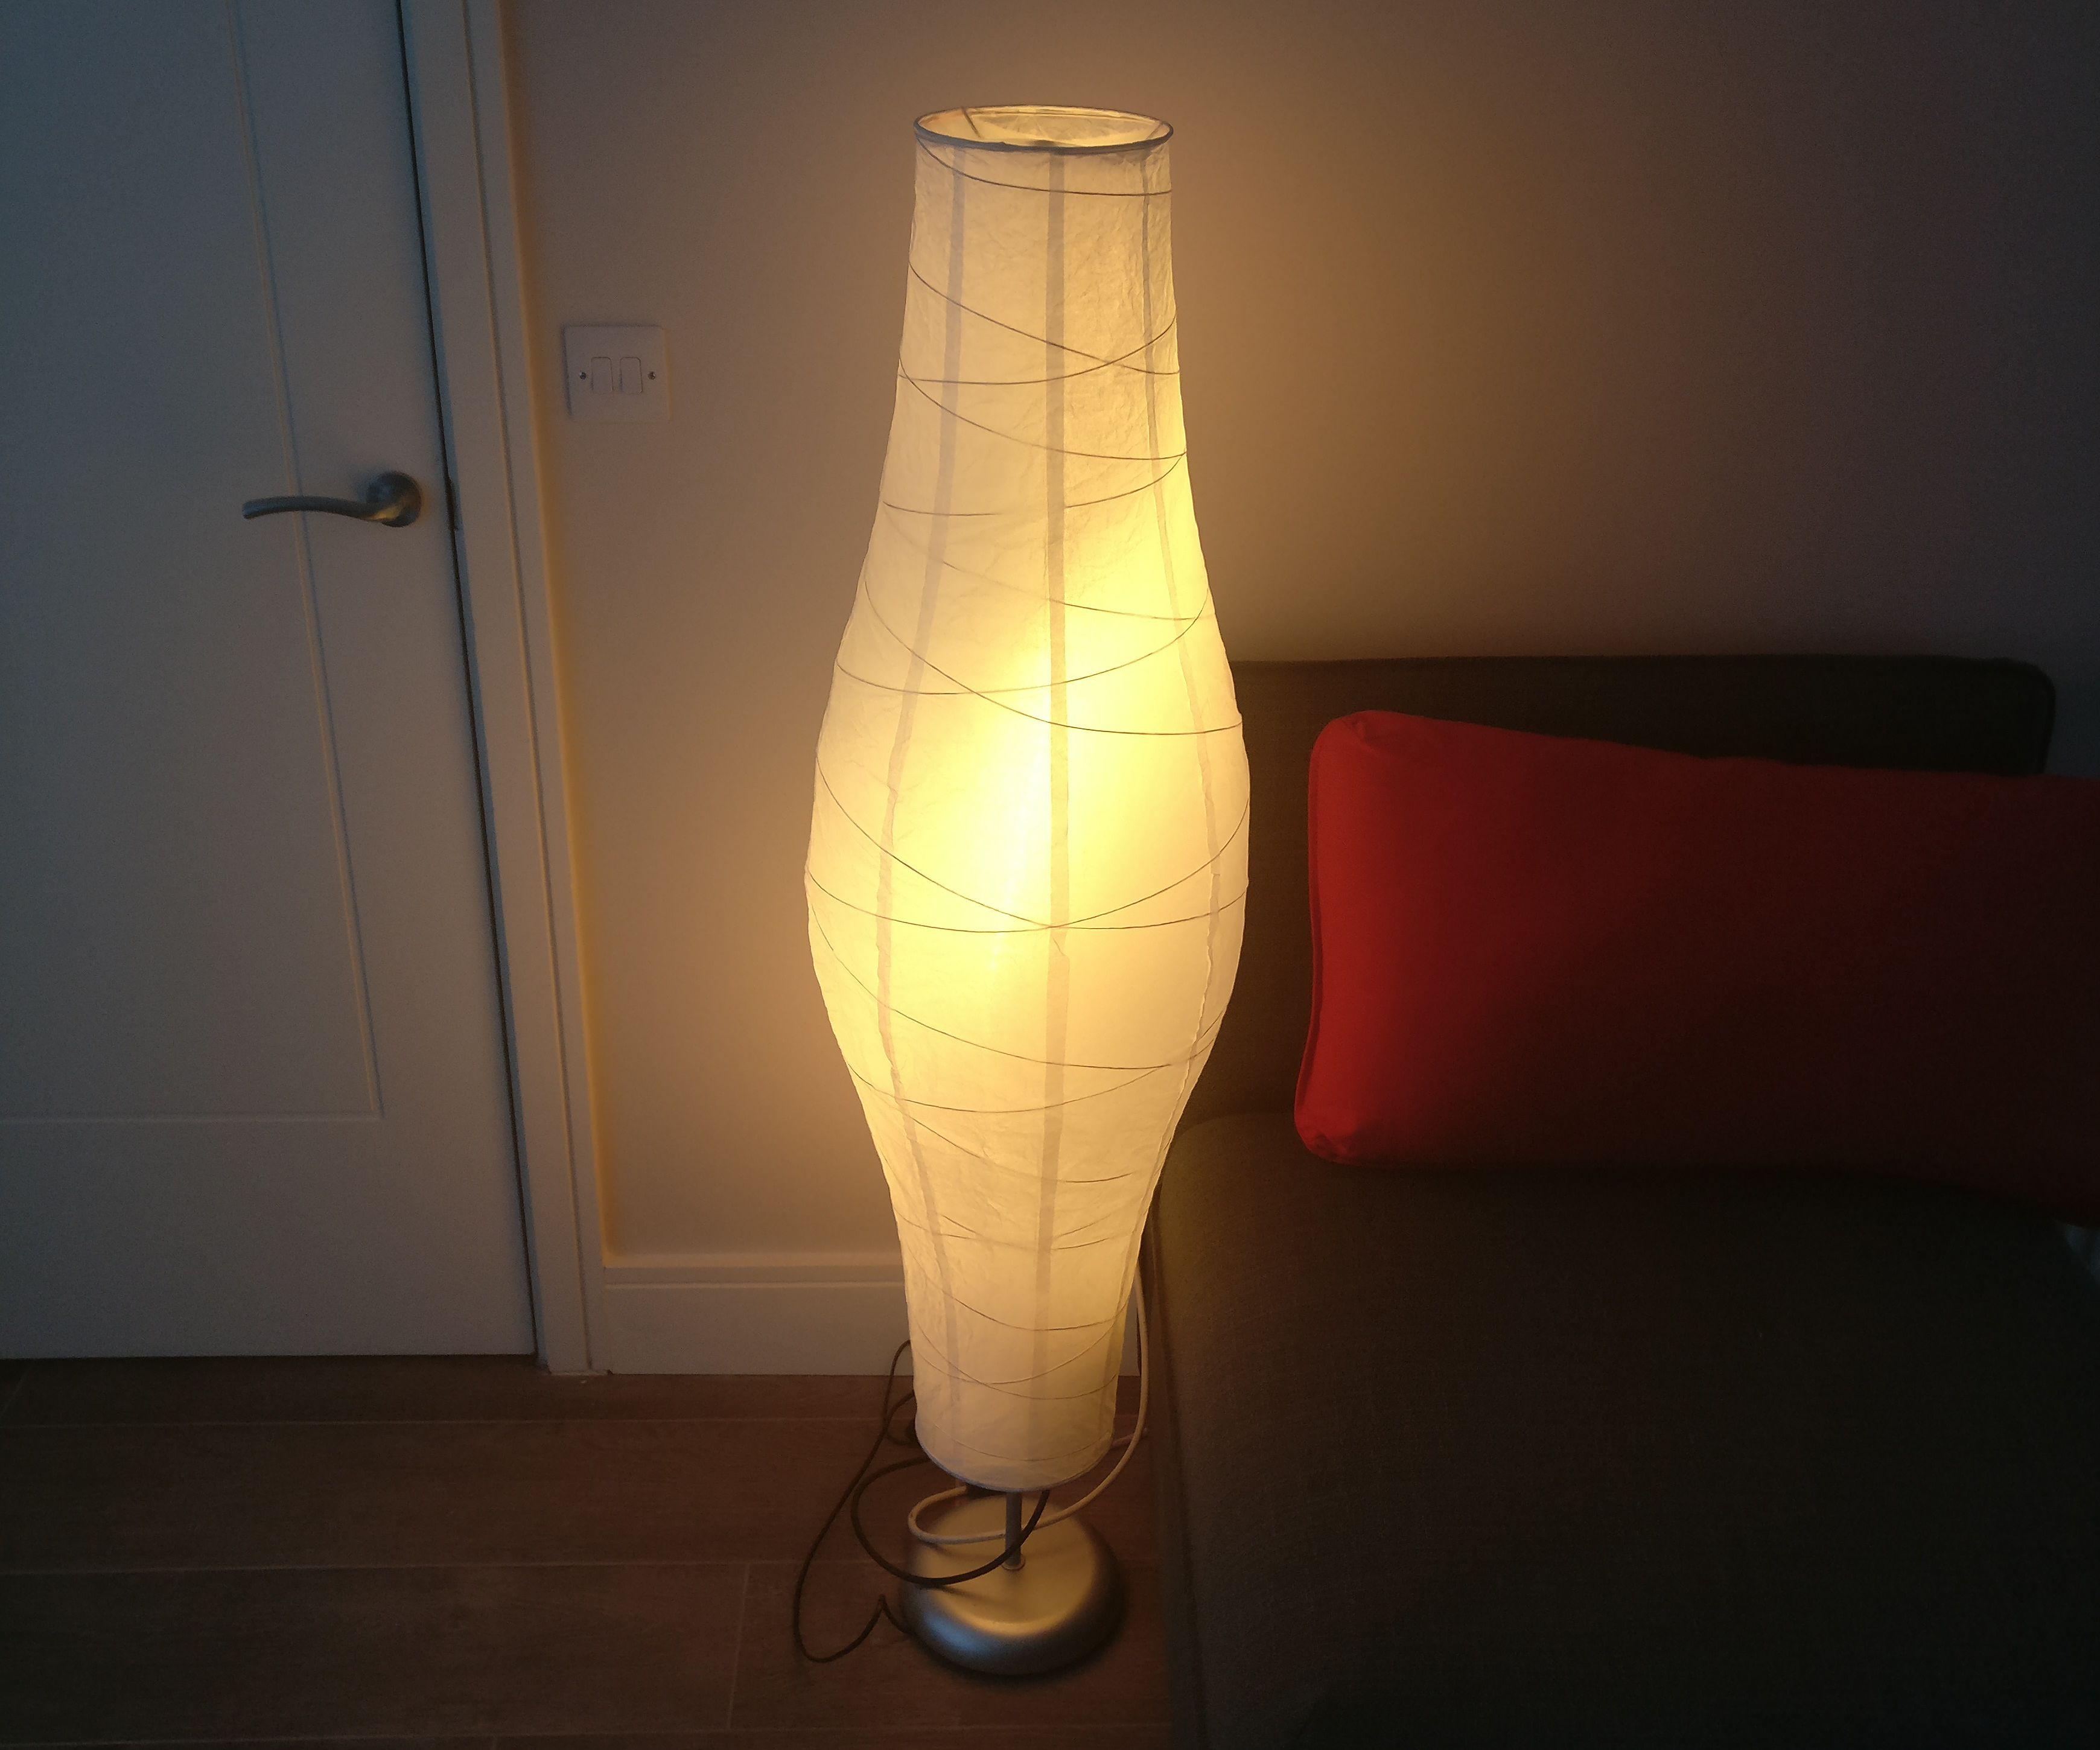 Arduino-based green&glowing Ikea Dudero lamp